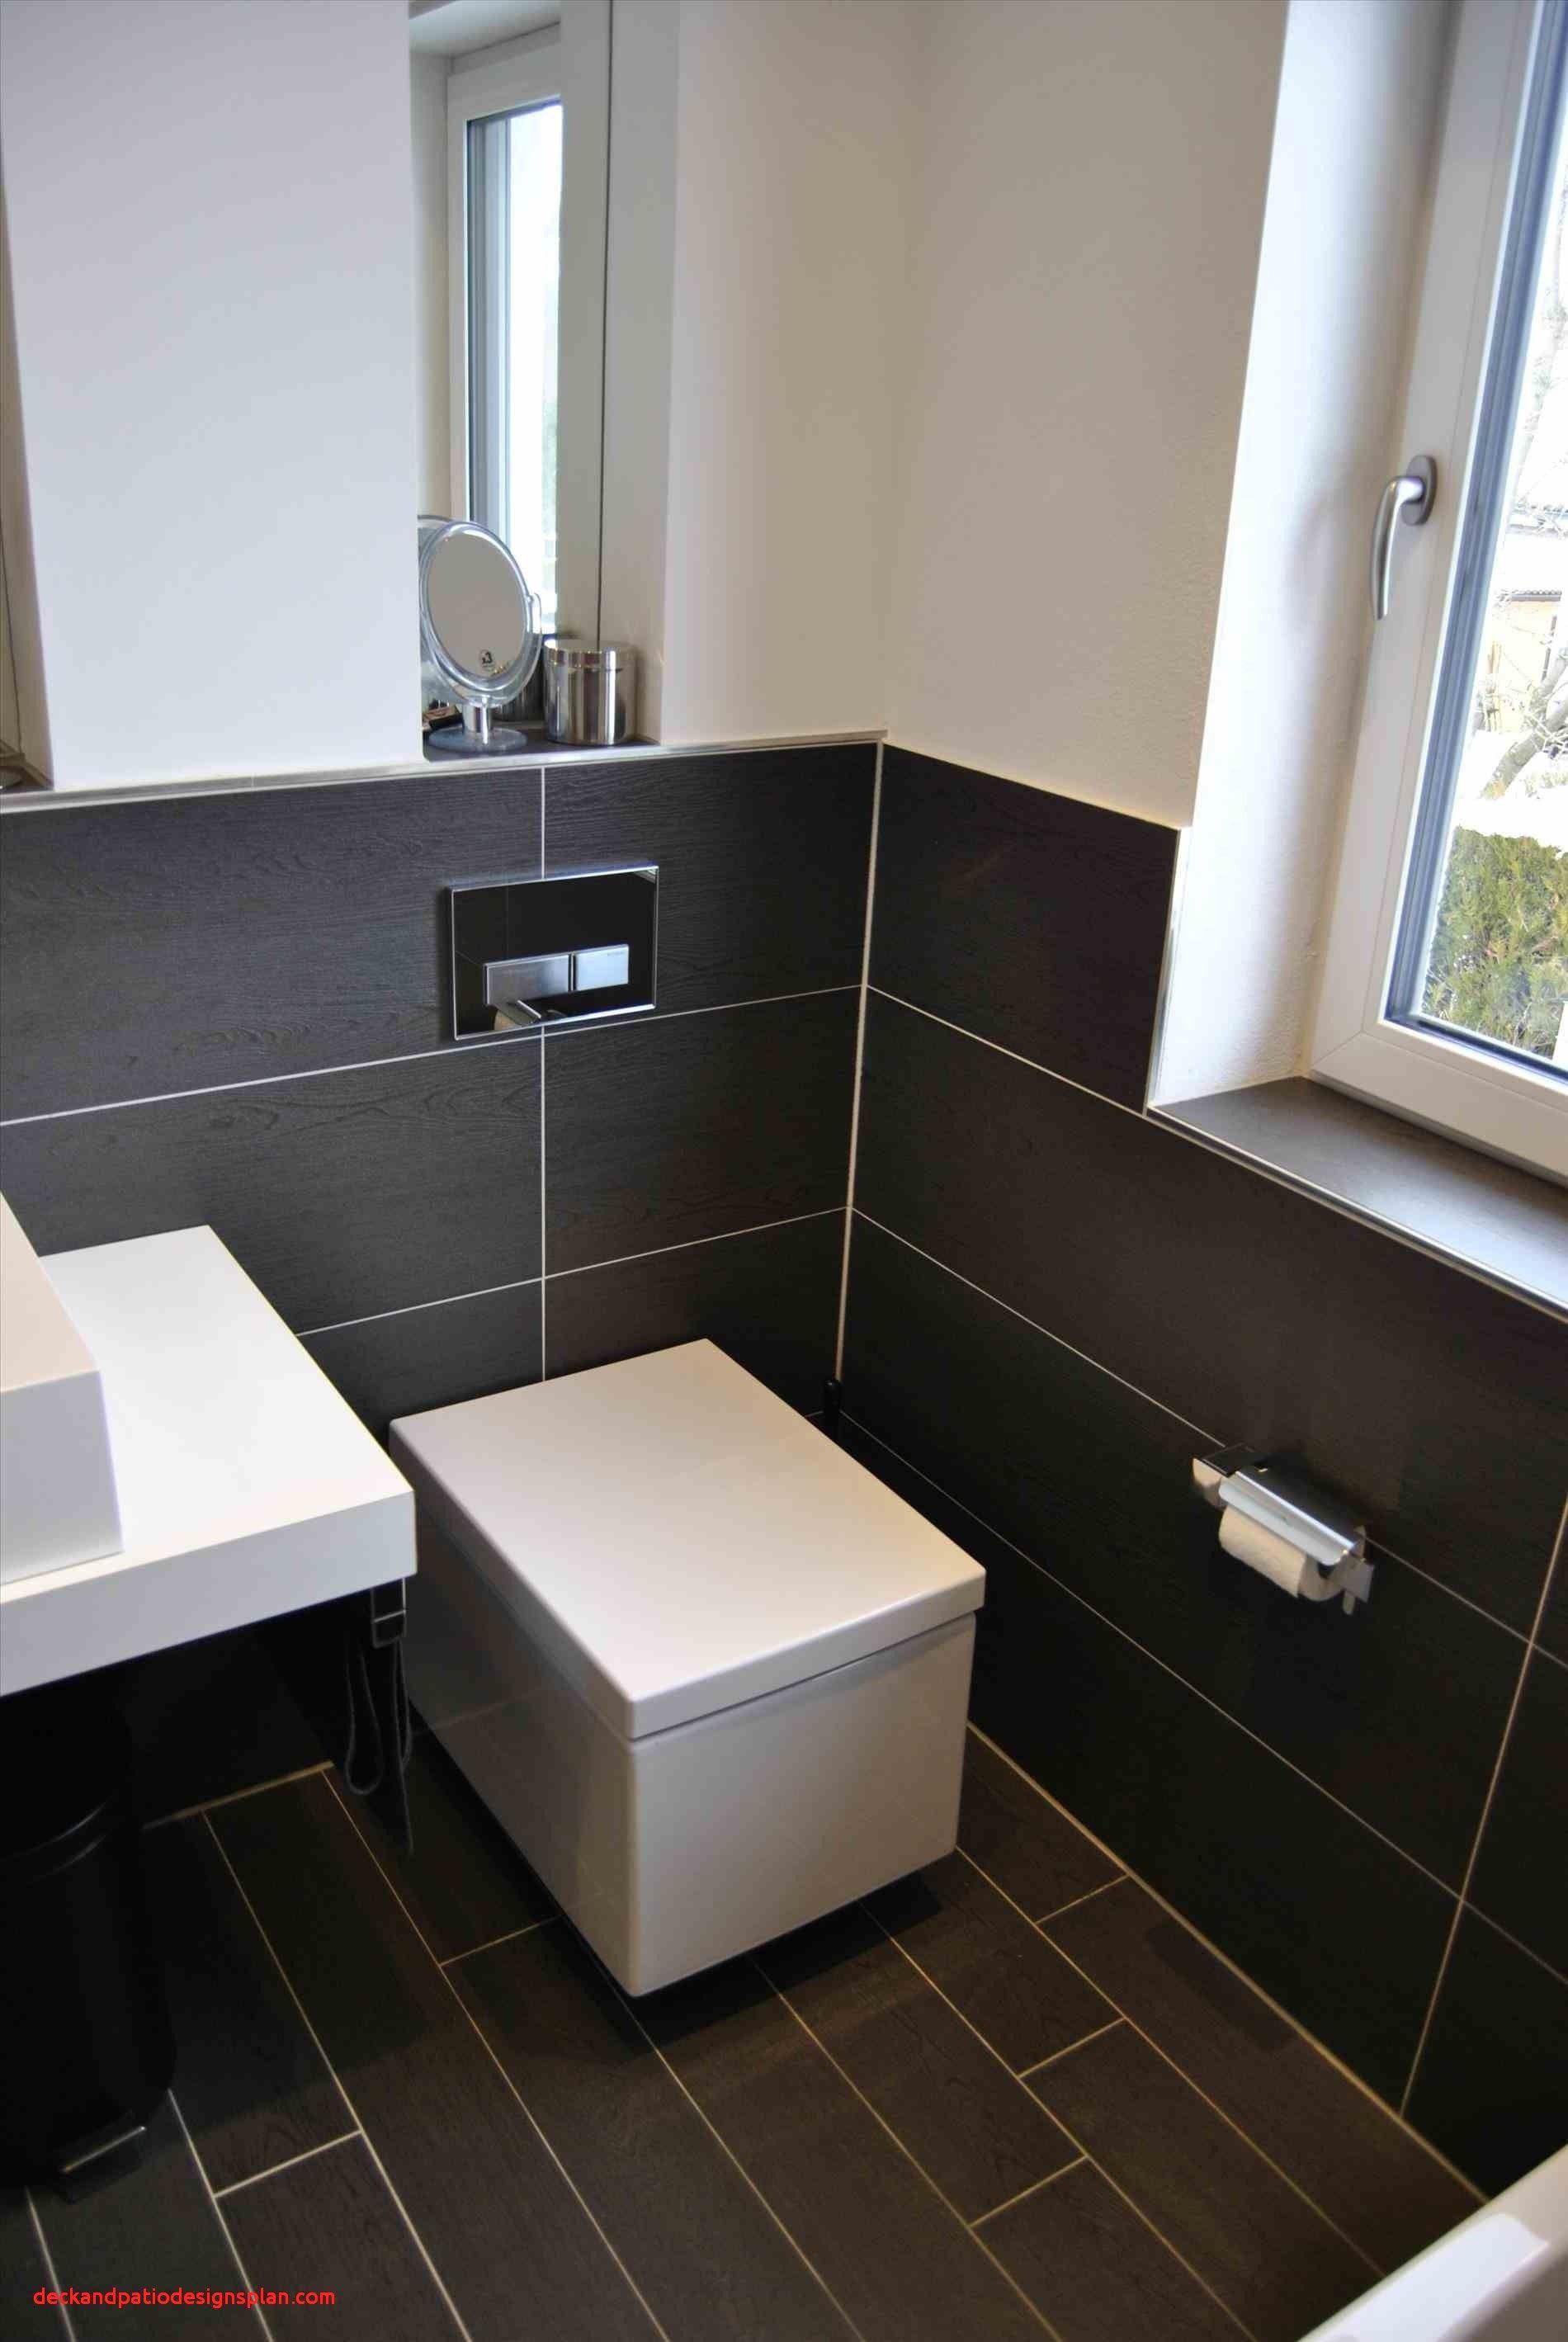 14 Badezimmer Umbau Fotos Ideen Neu Neu Rollo Bad Lapetitemaisonnyc Eintagamsee Badezimmer Fliesen Neues Badezimmer Badezimmerboden